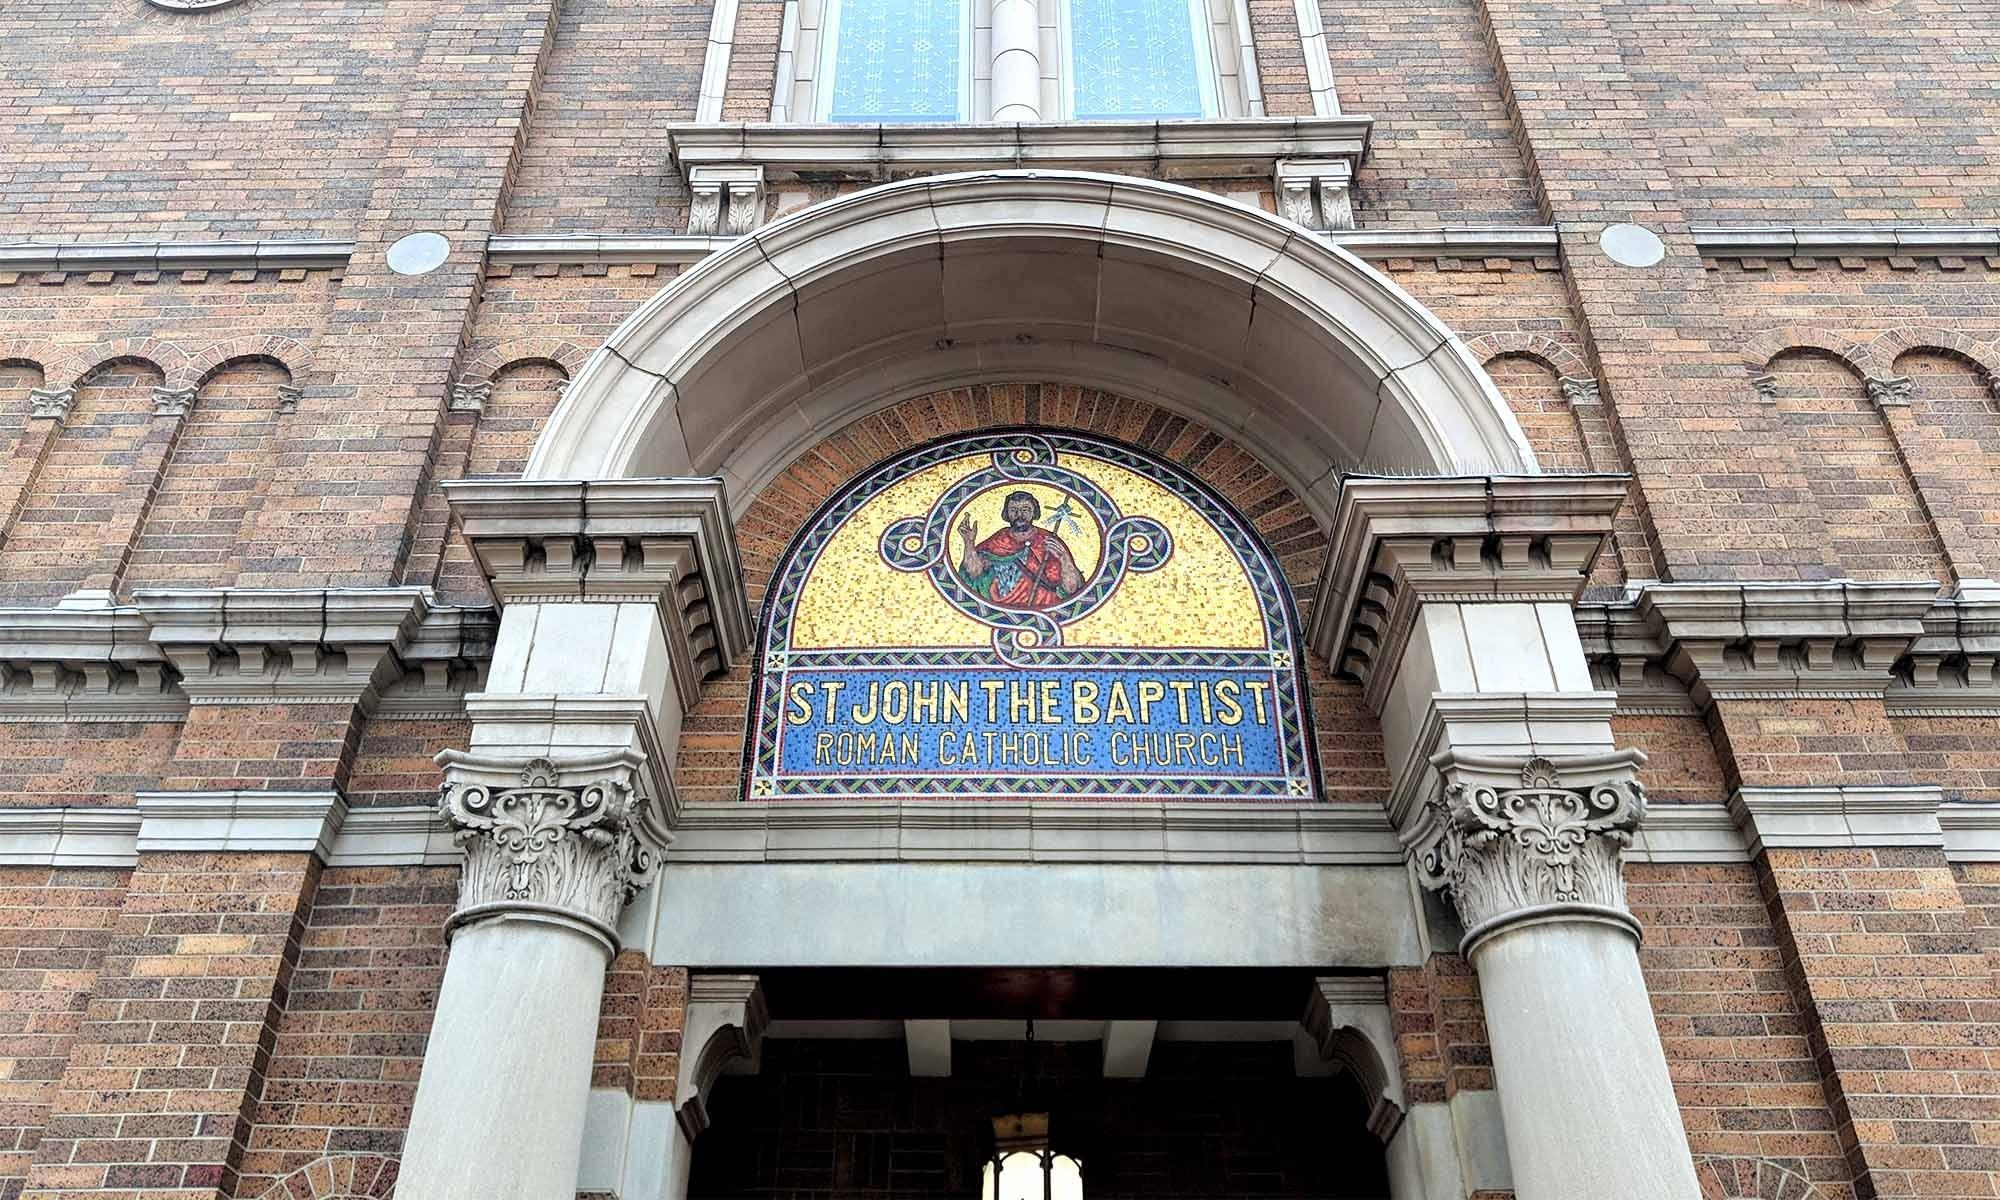 St. John the Baptist Parish Center